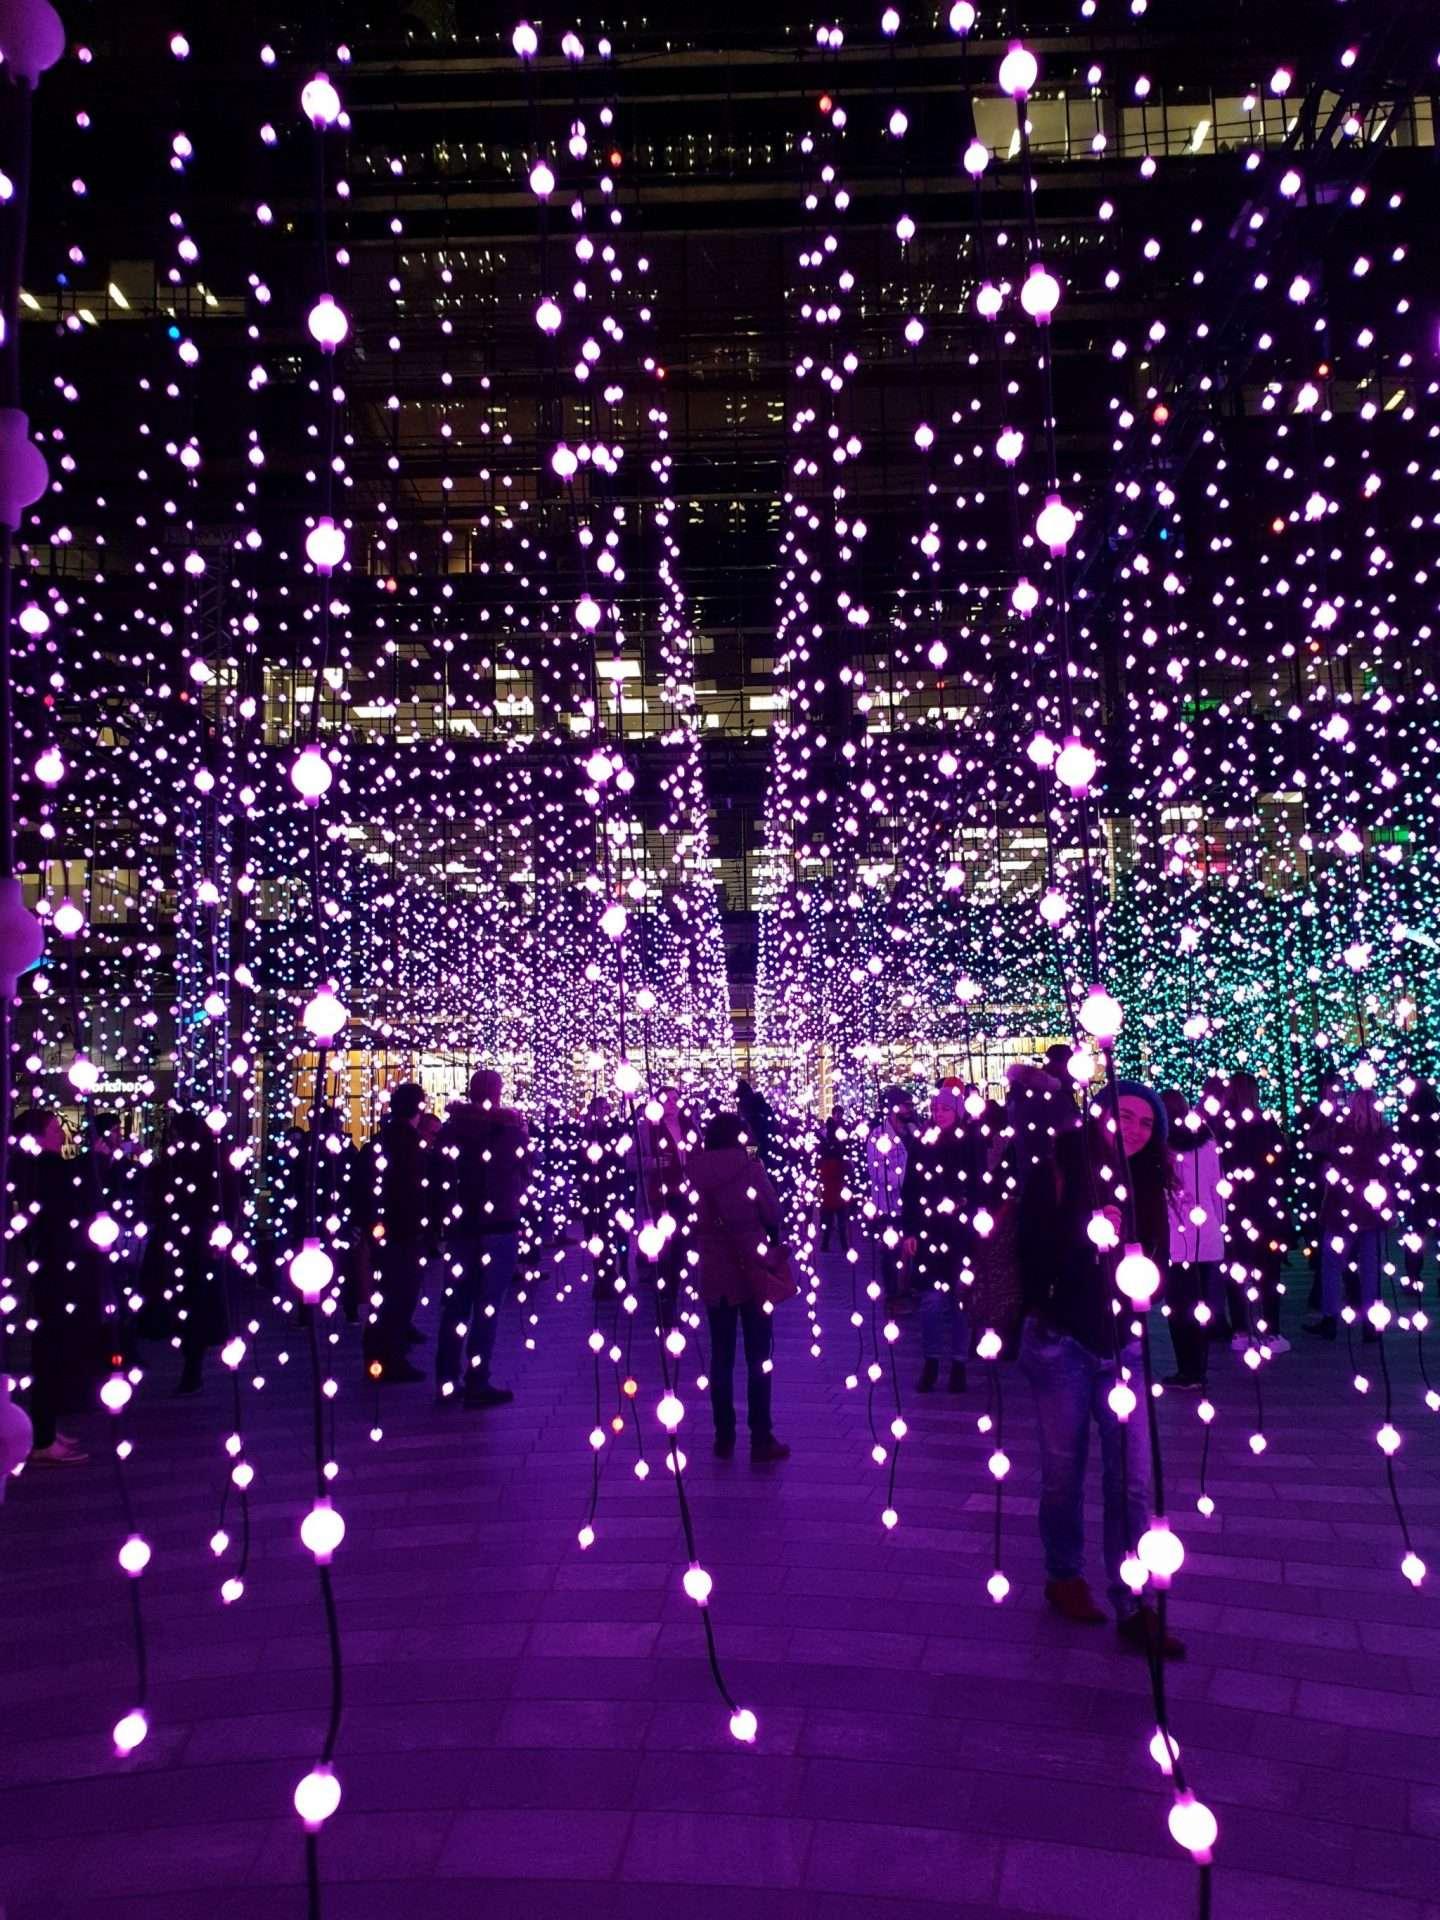 Stunning Purple Submergence